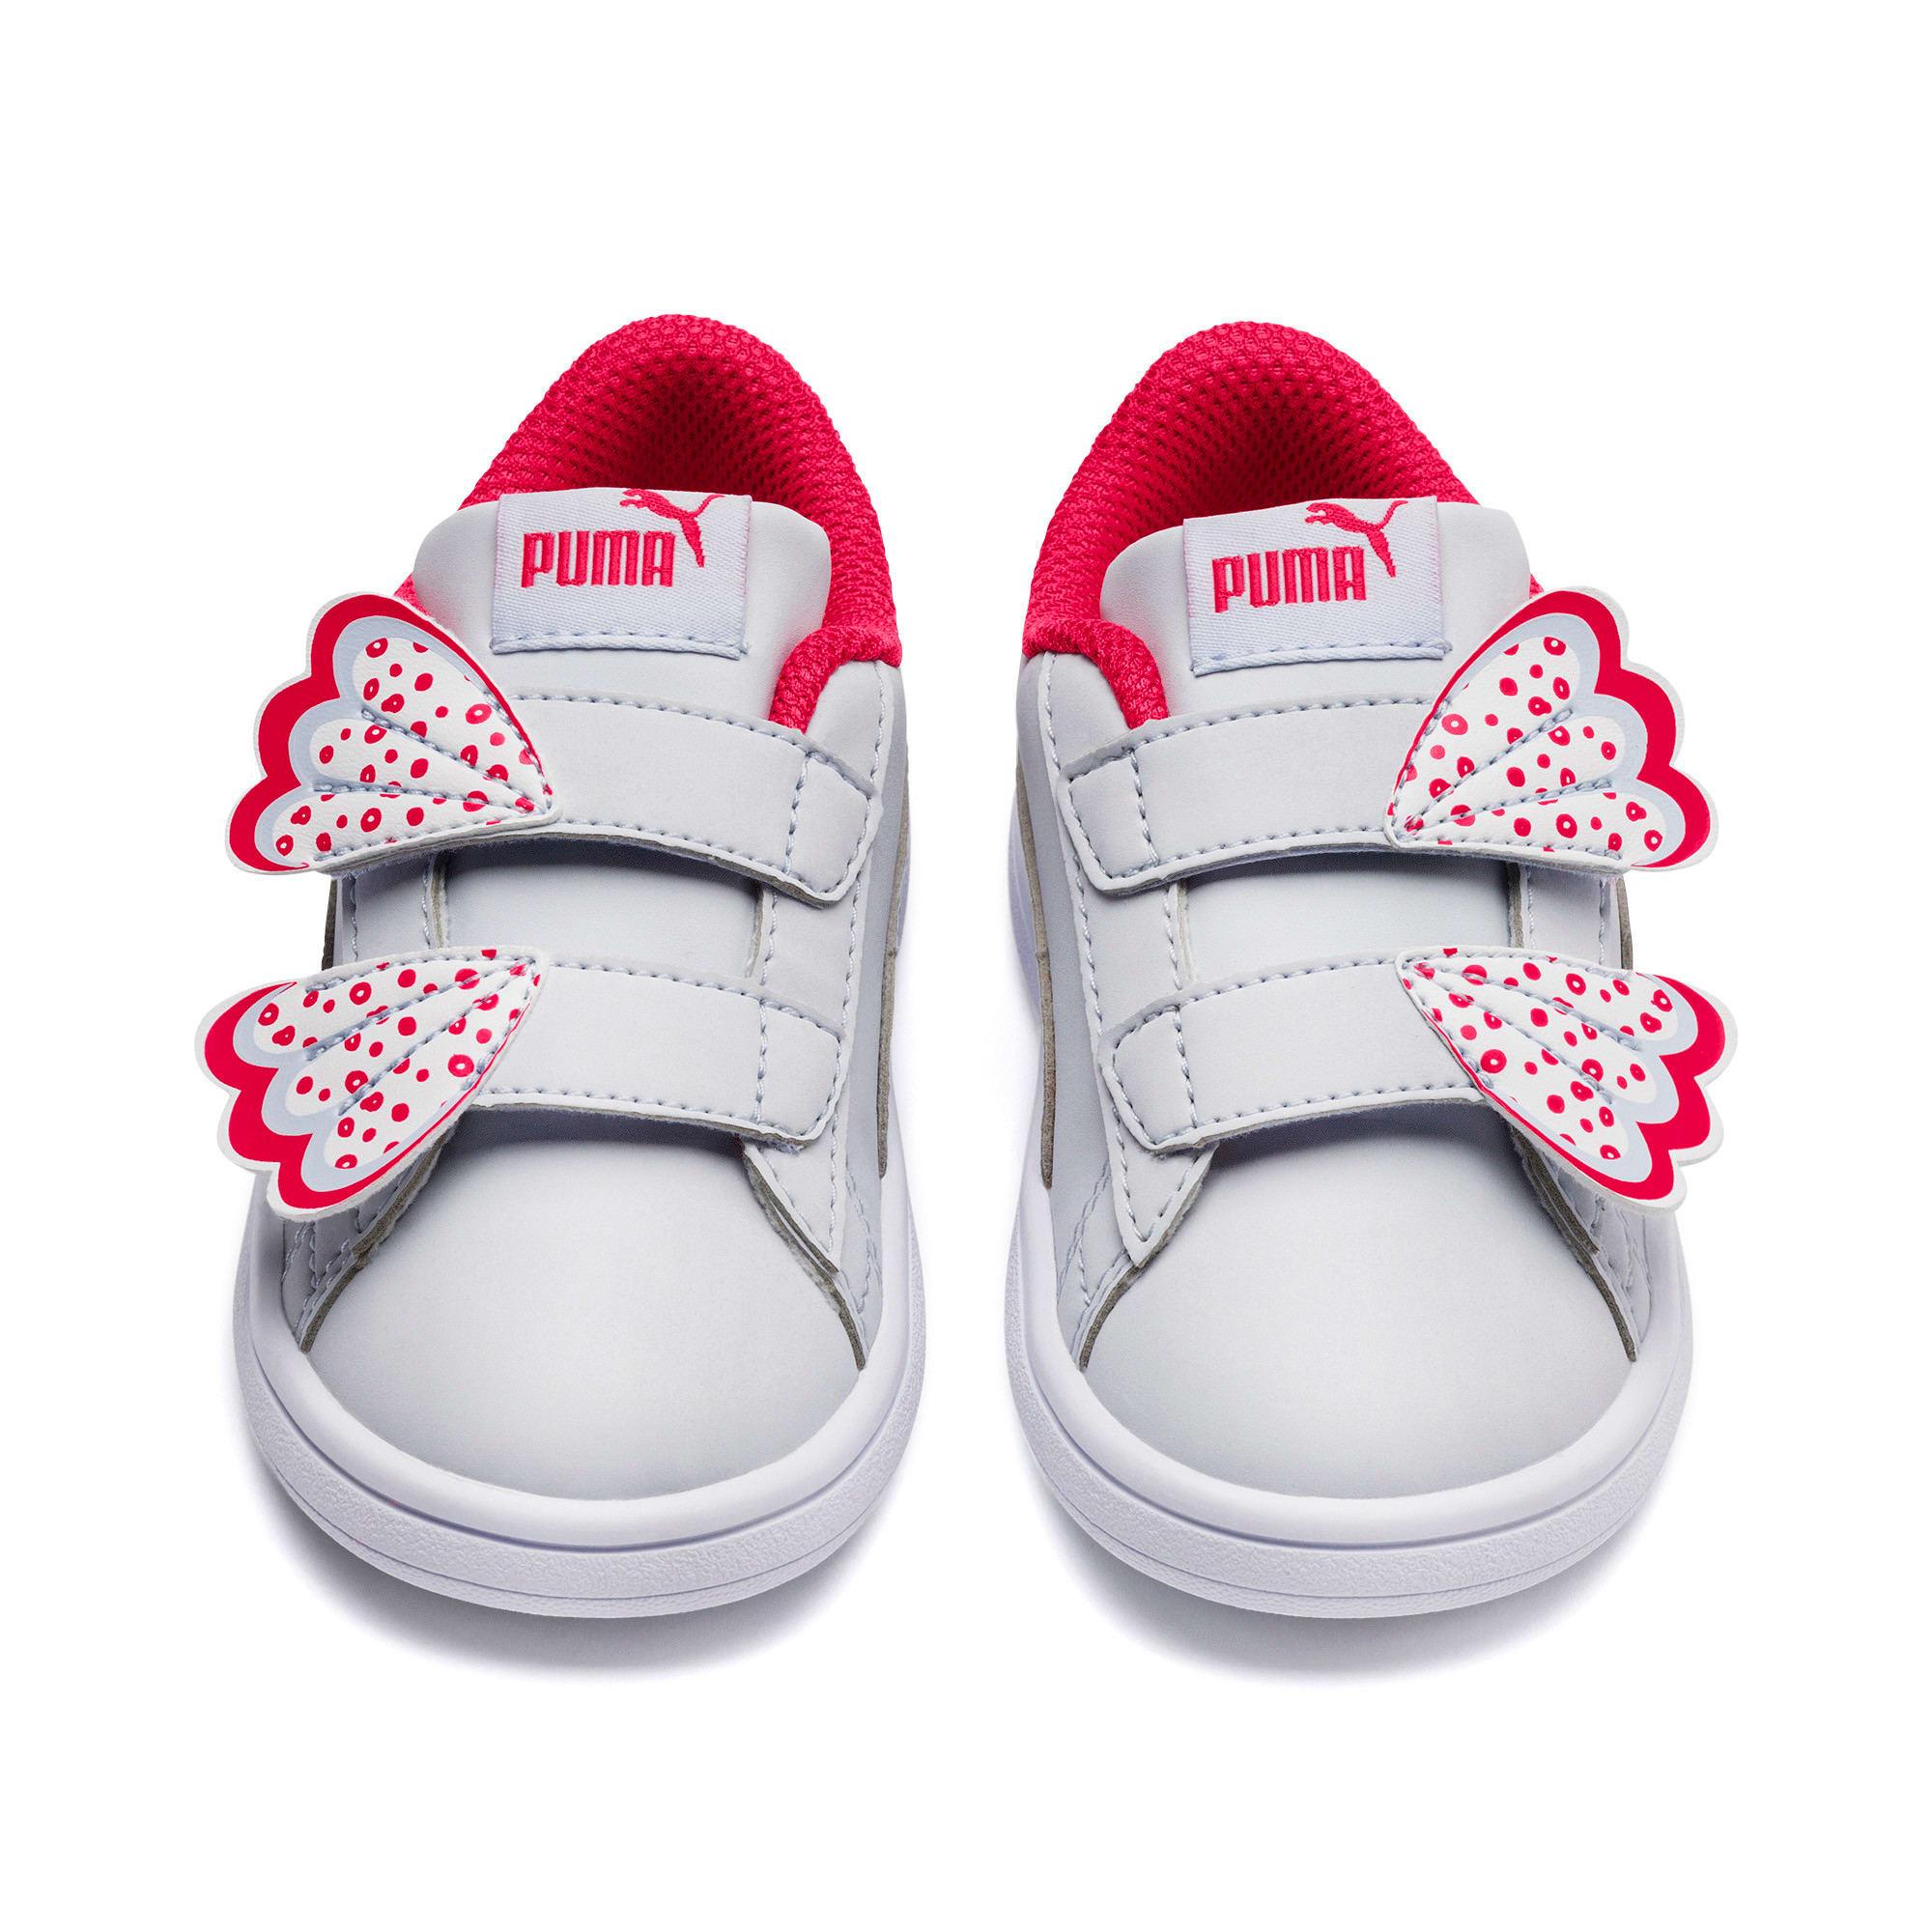 Thumbnail 7 of PUMA Smash v2 Butterfly AC Toddler Shoes, Heather-Nrgy Rose-Puma White, medium